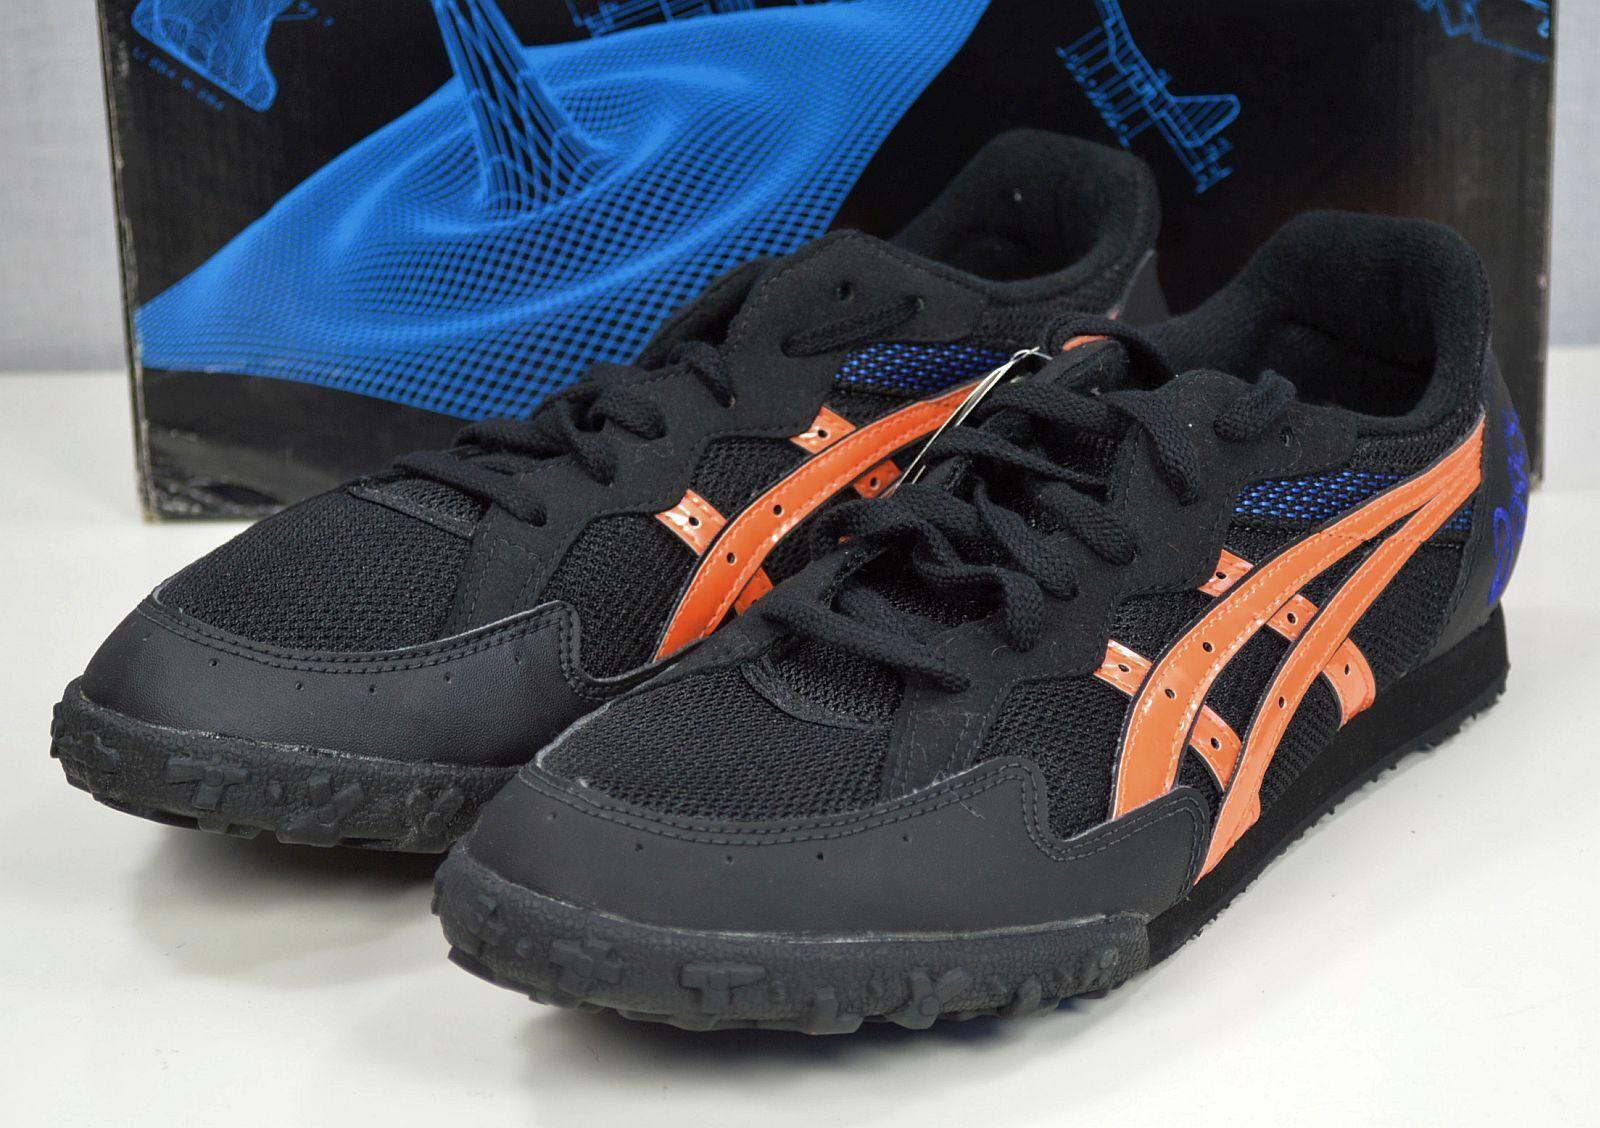 Asics Omni Trail Laufschuhe Gr. 43,5 Sportschuhe Herren Schuhe sale 46061700